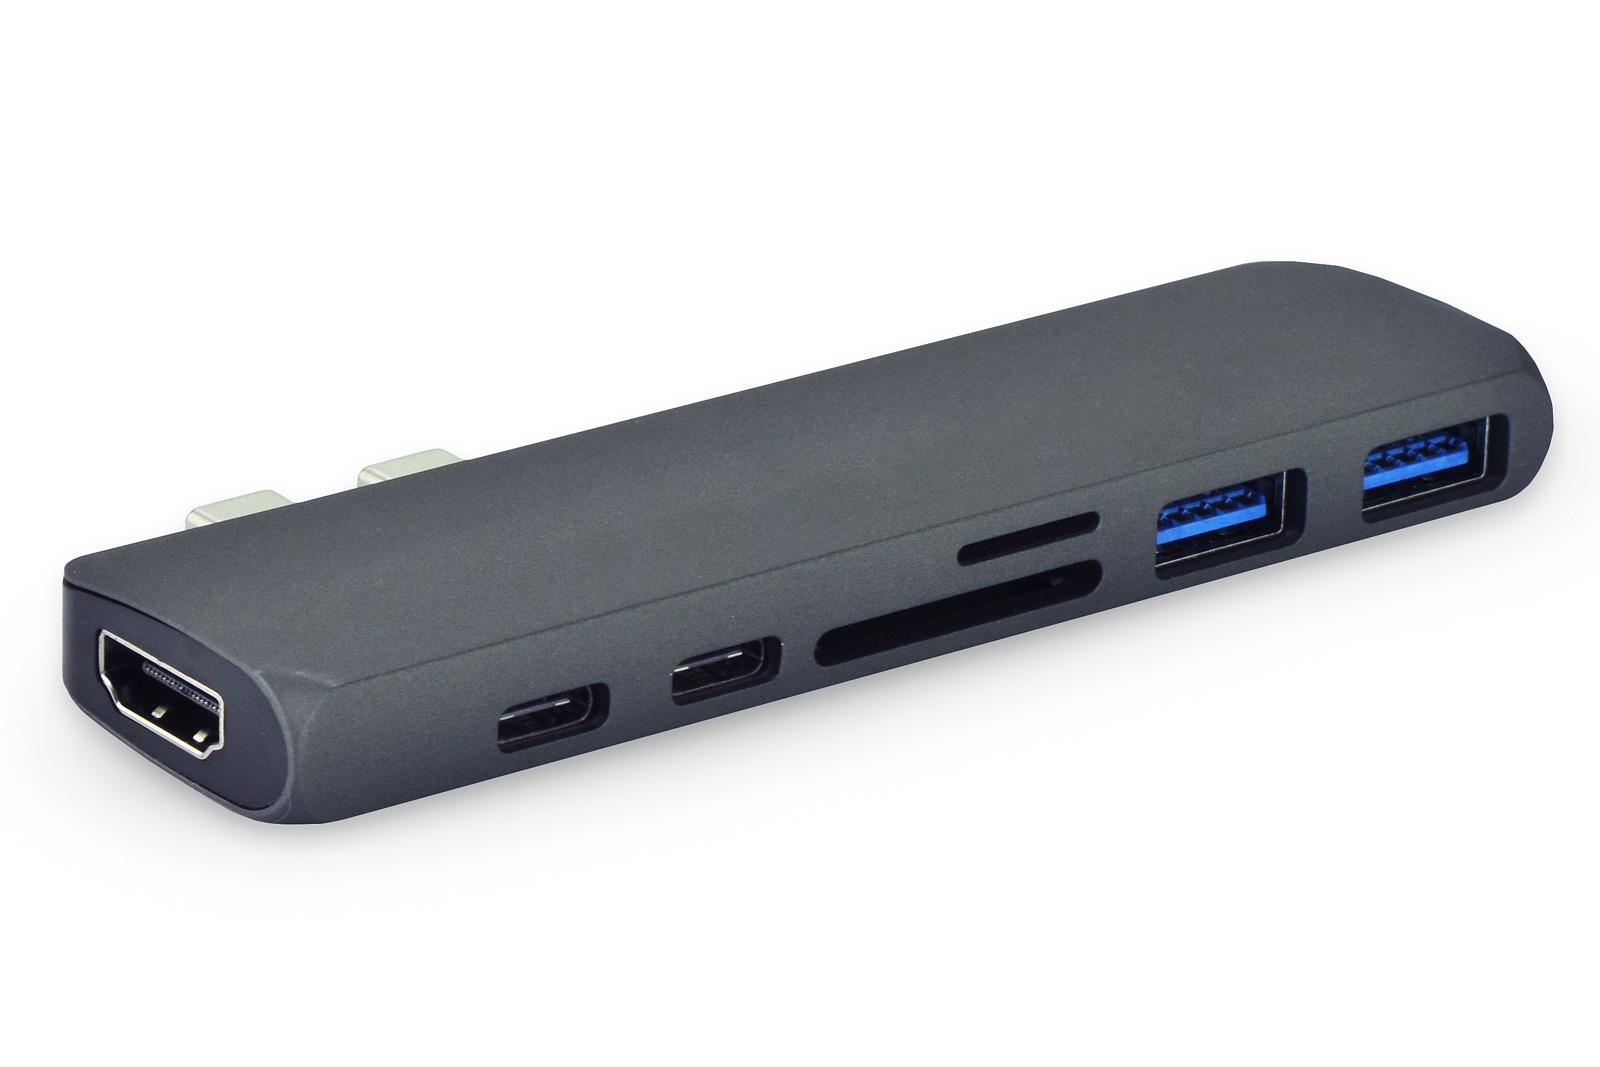 USB-концентратор Gurdini HUB 7 ports для Macbook Type-C to HDMI/USB/Card reader, черно-серый leef access c microsd reader usb c